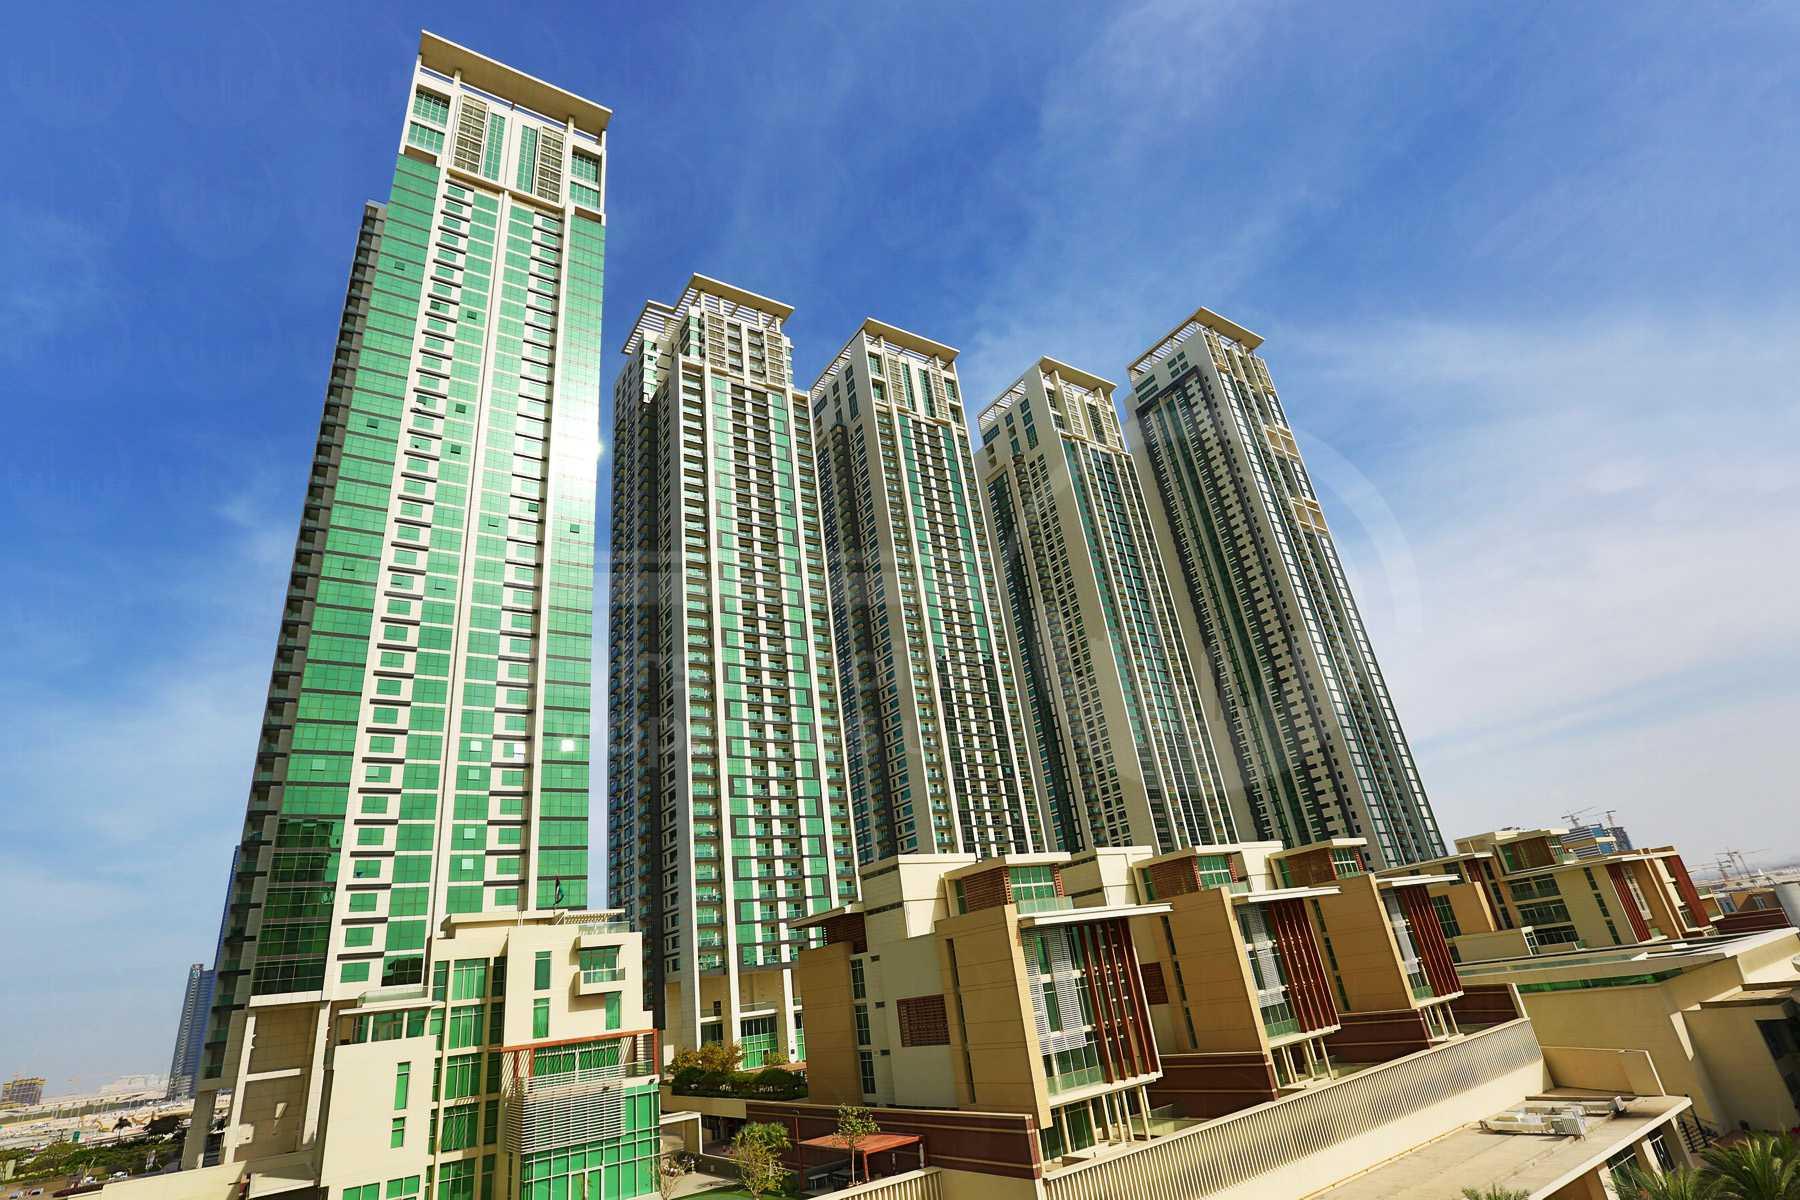 Studio - 1BR - 2BR - 3BR - 4BR Apartment - Abu Dhabi - UAE - Al Reem Island - Tala Tower - Outside View (14).jpg